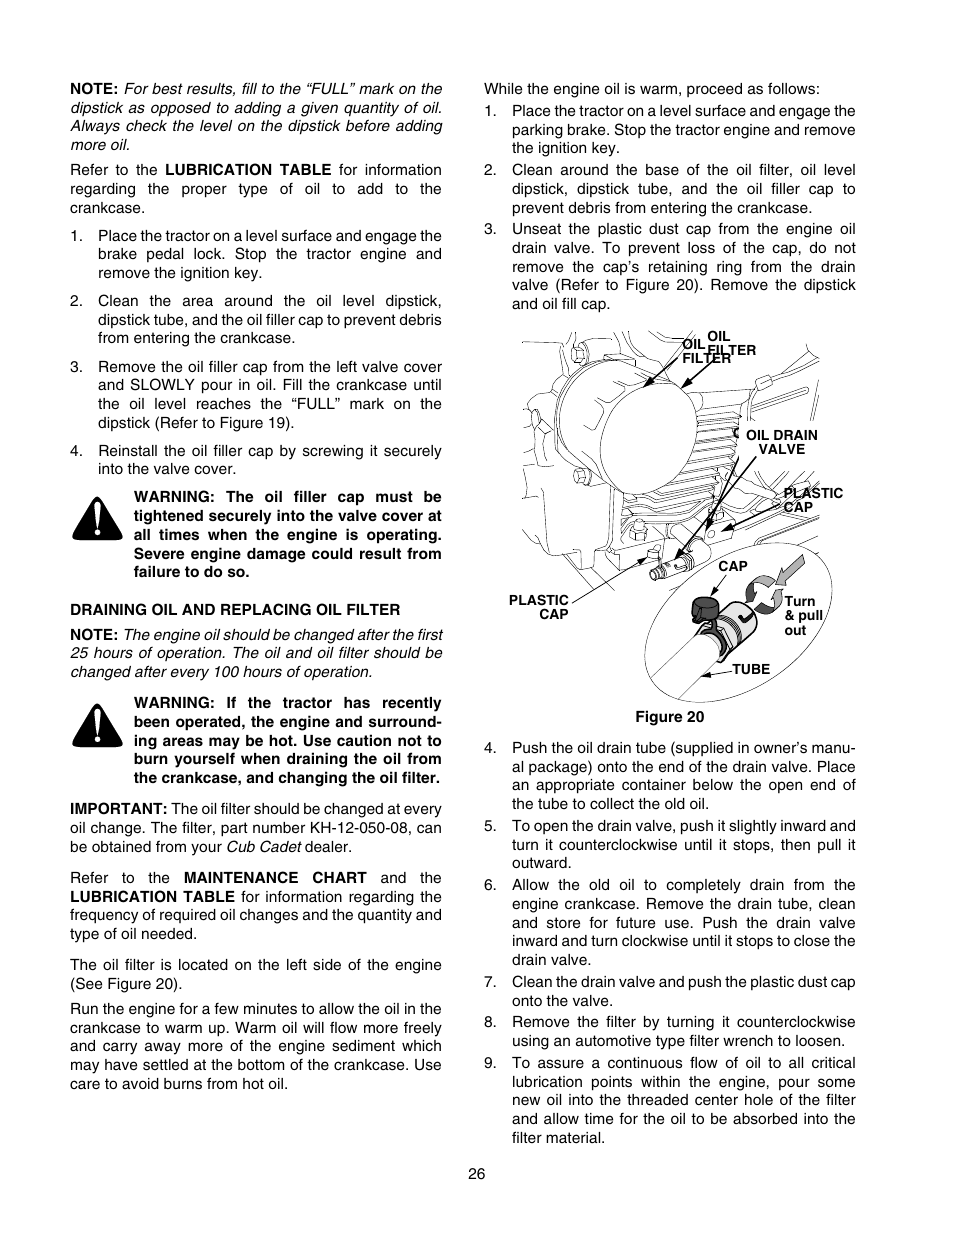 Cub Cadet Gt 2550 Owners Manual Enthusiast Wiring Diagrams Gt2550 Diagram User Page 26 56 Rh Manualsdir Com 2006 Tractor Lt 1554 Parts